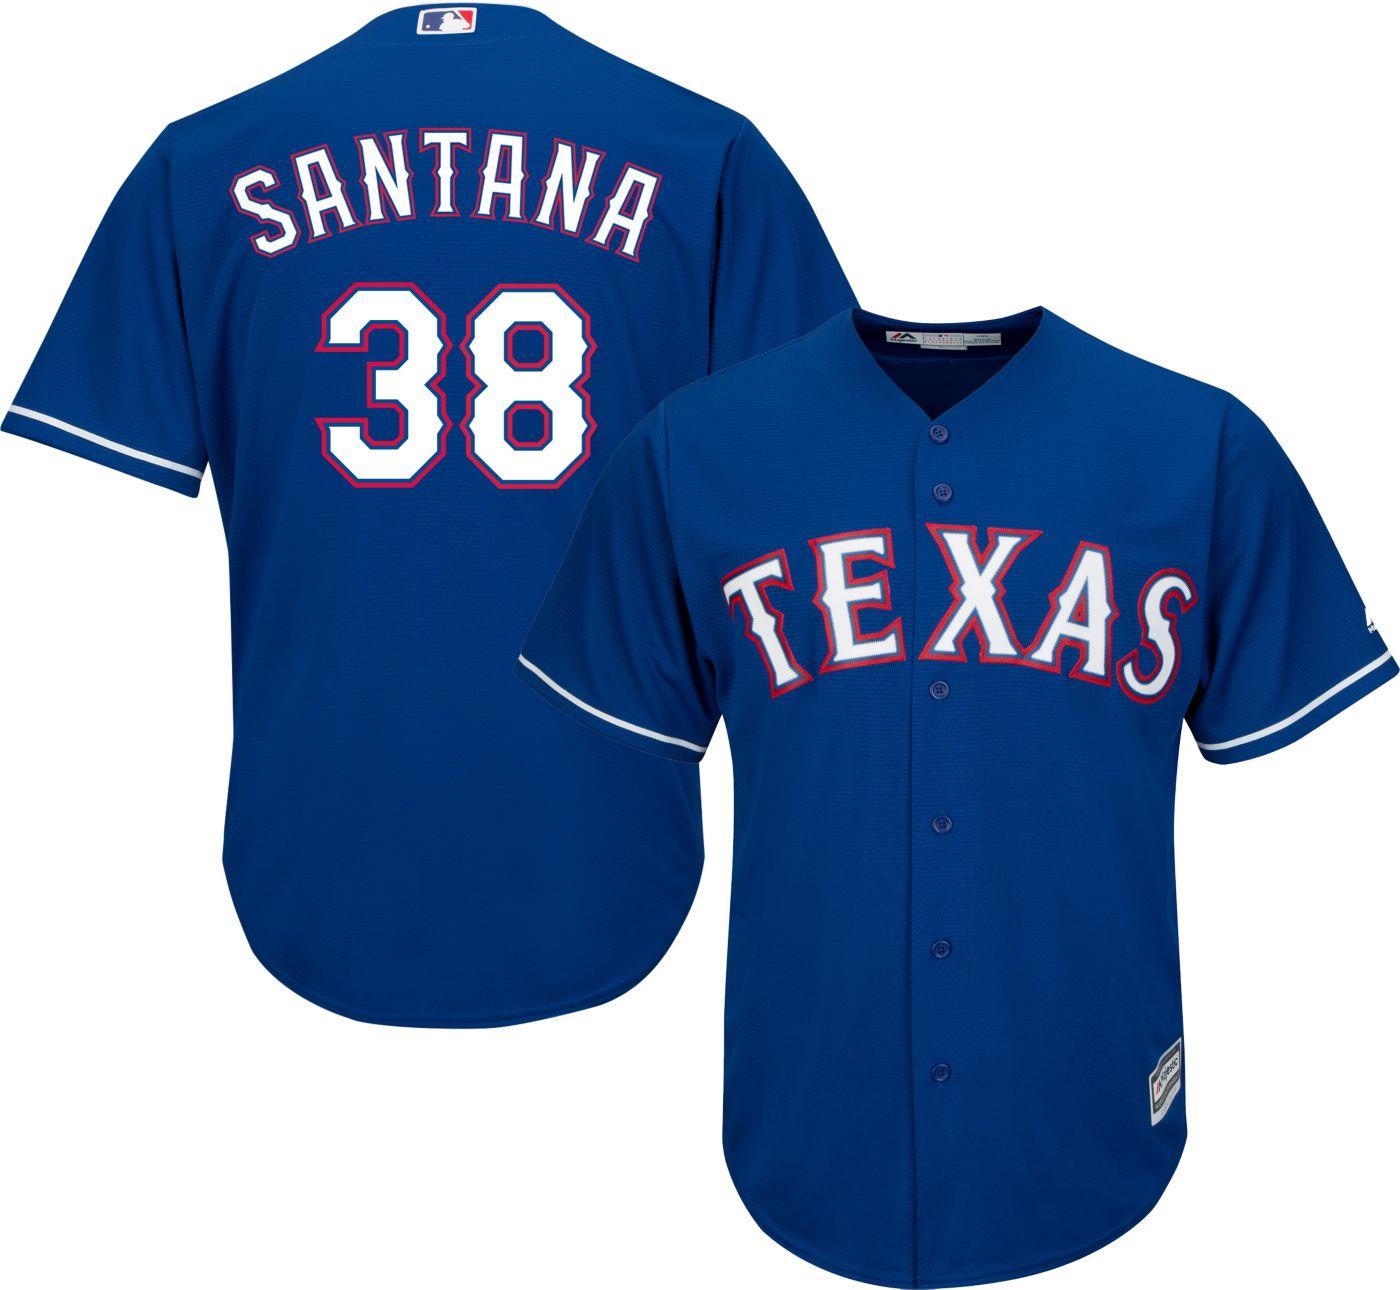 Majestic Youth Replica Texas Rangers Daniel Santana #38 Cool Base Alternate Royal Jersey